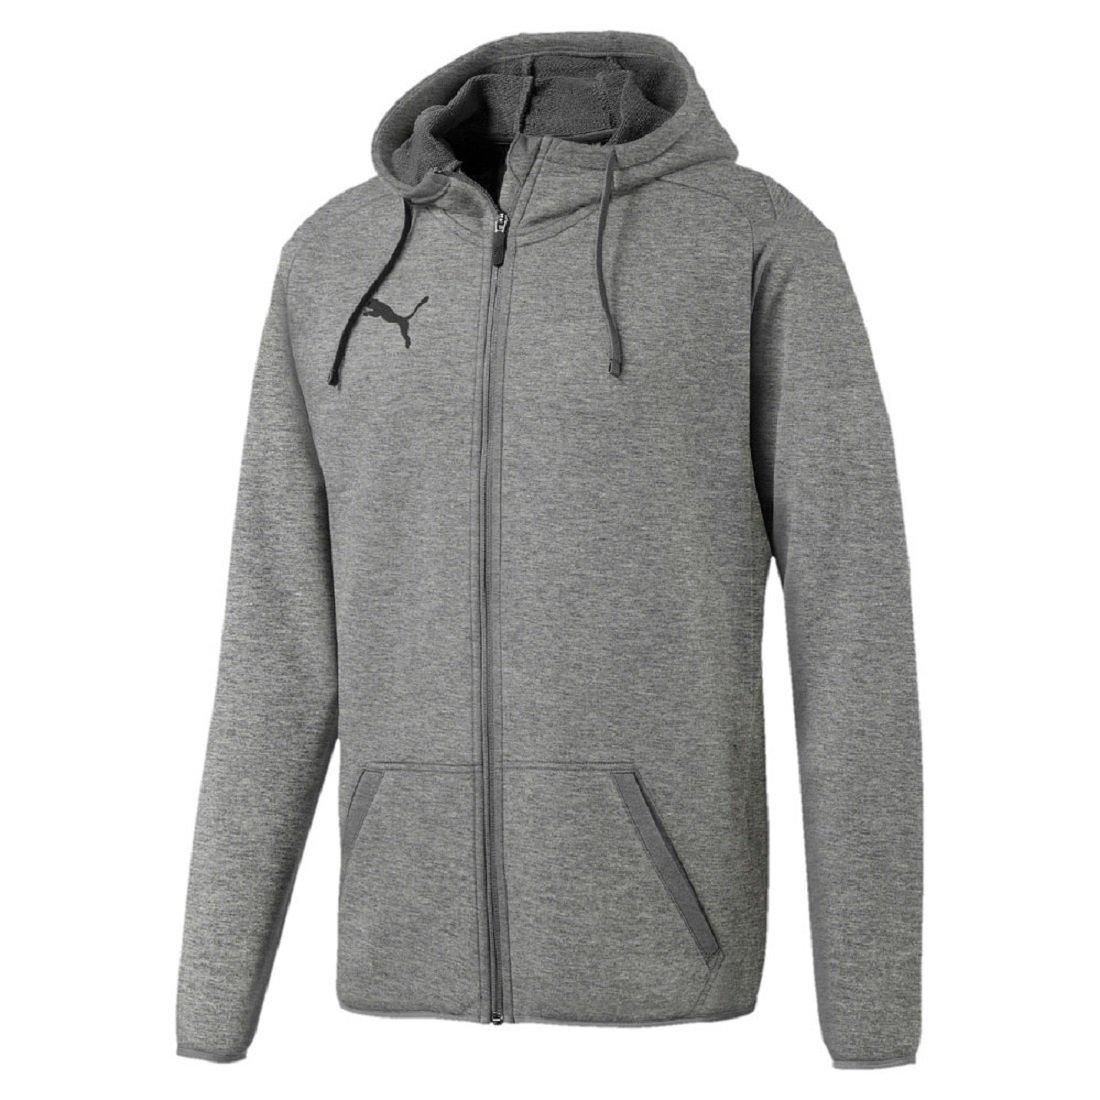 TALLA M. Puma Liga Casuals Hoody Jacket Sudadera, Hombre